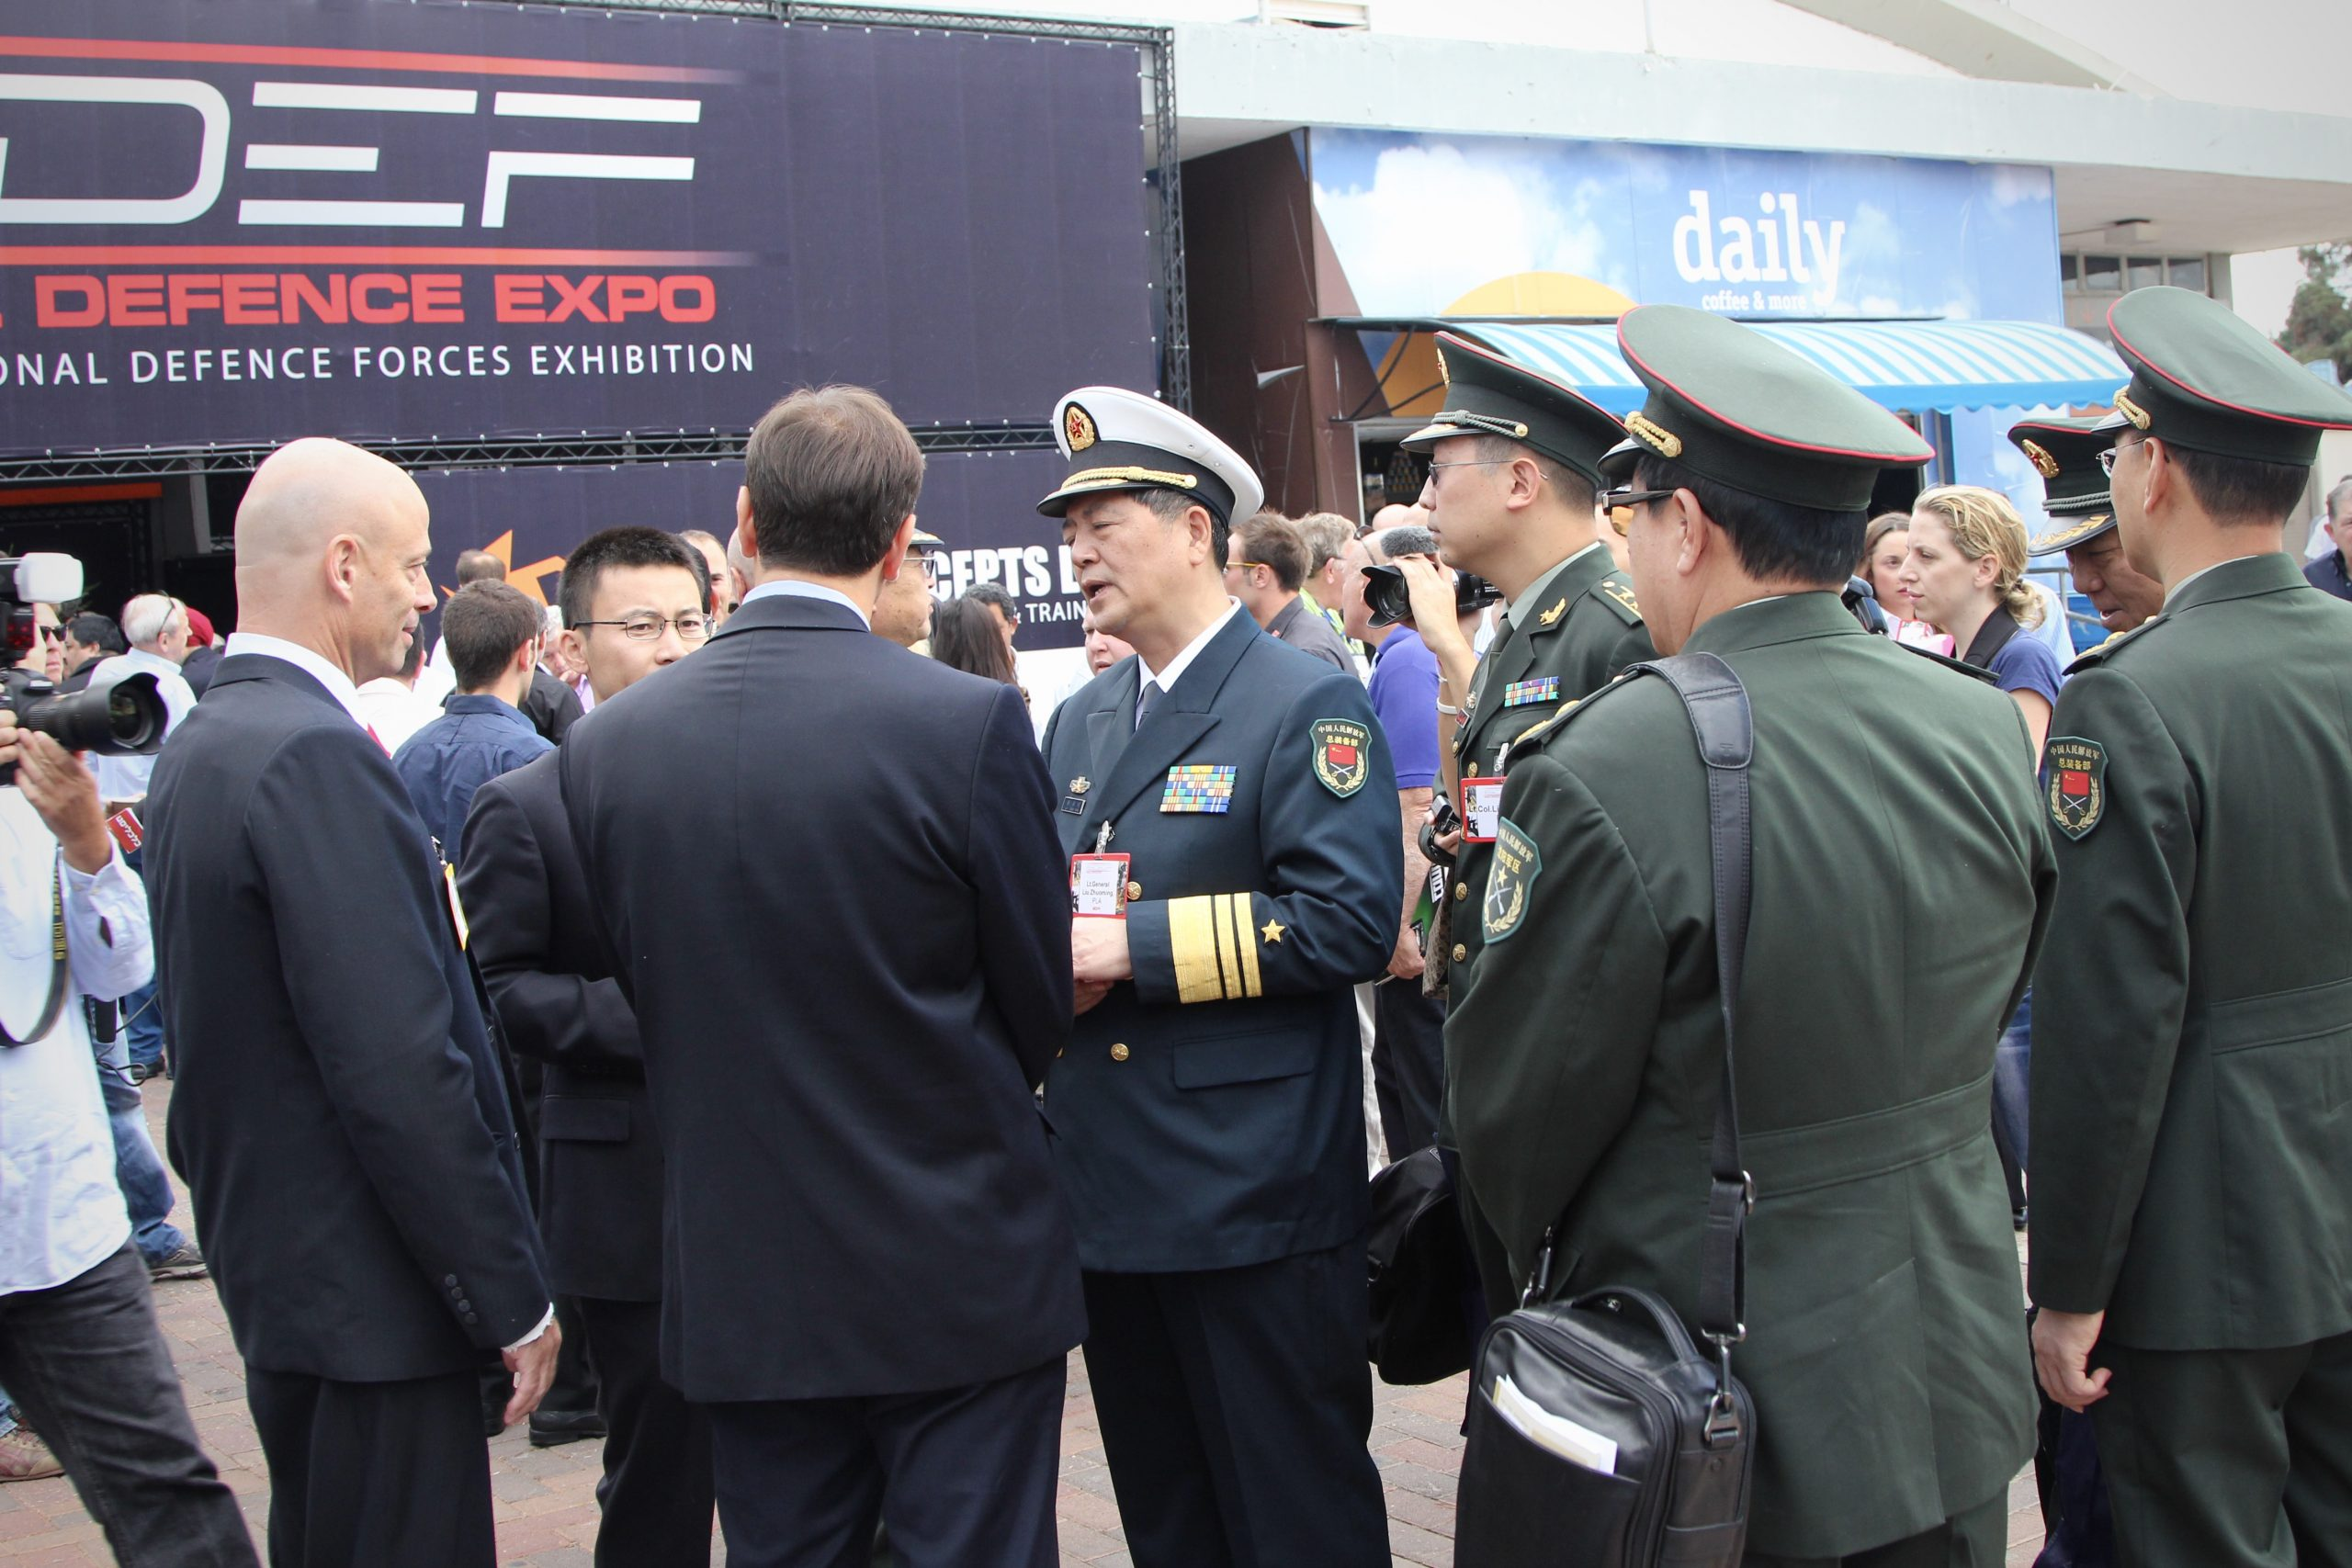 Defense Conference